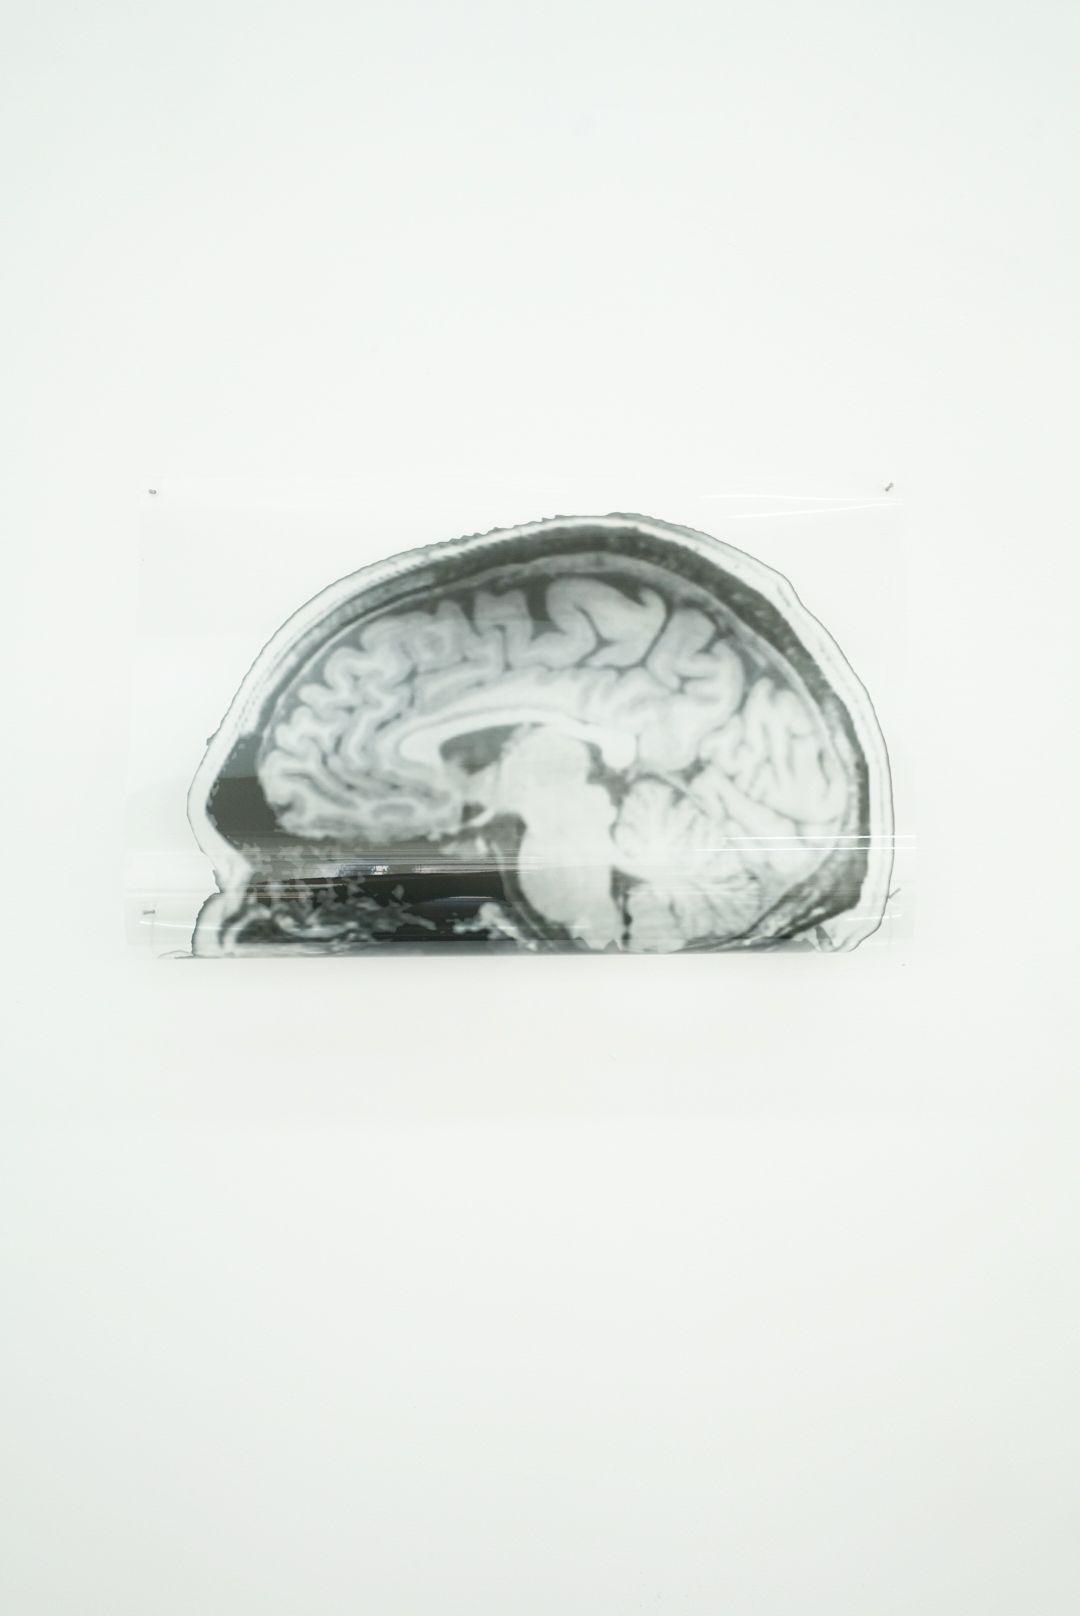 MICHAEL VICKERS | ARTIST PORTRAIT 2(MRI/MEG)| ARCHIVAL PIGMENT PRINT ON CLEAR MYLAR | 13 X 17 INCHES| 2017